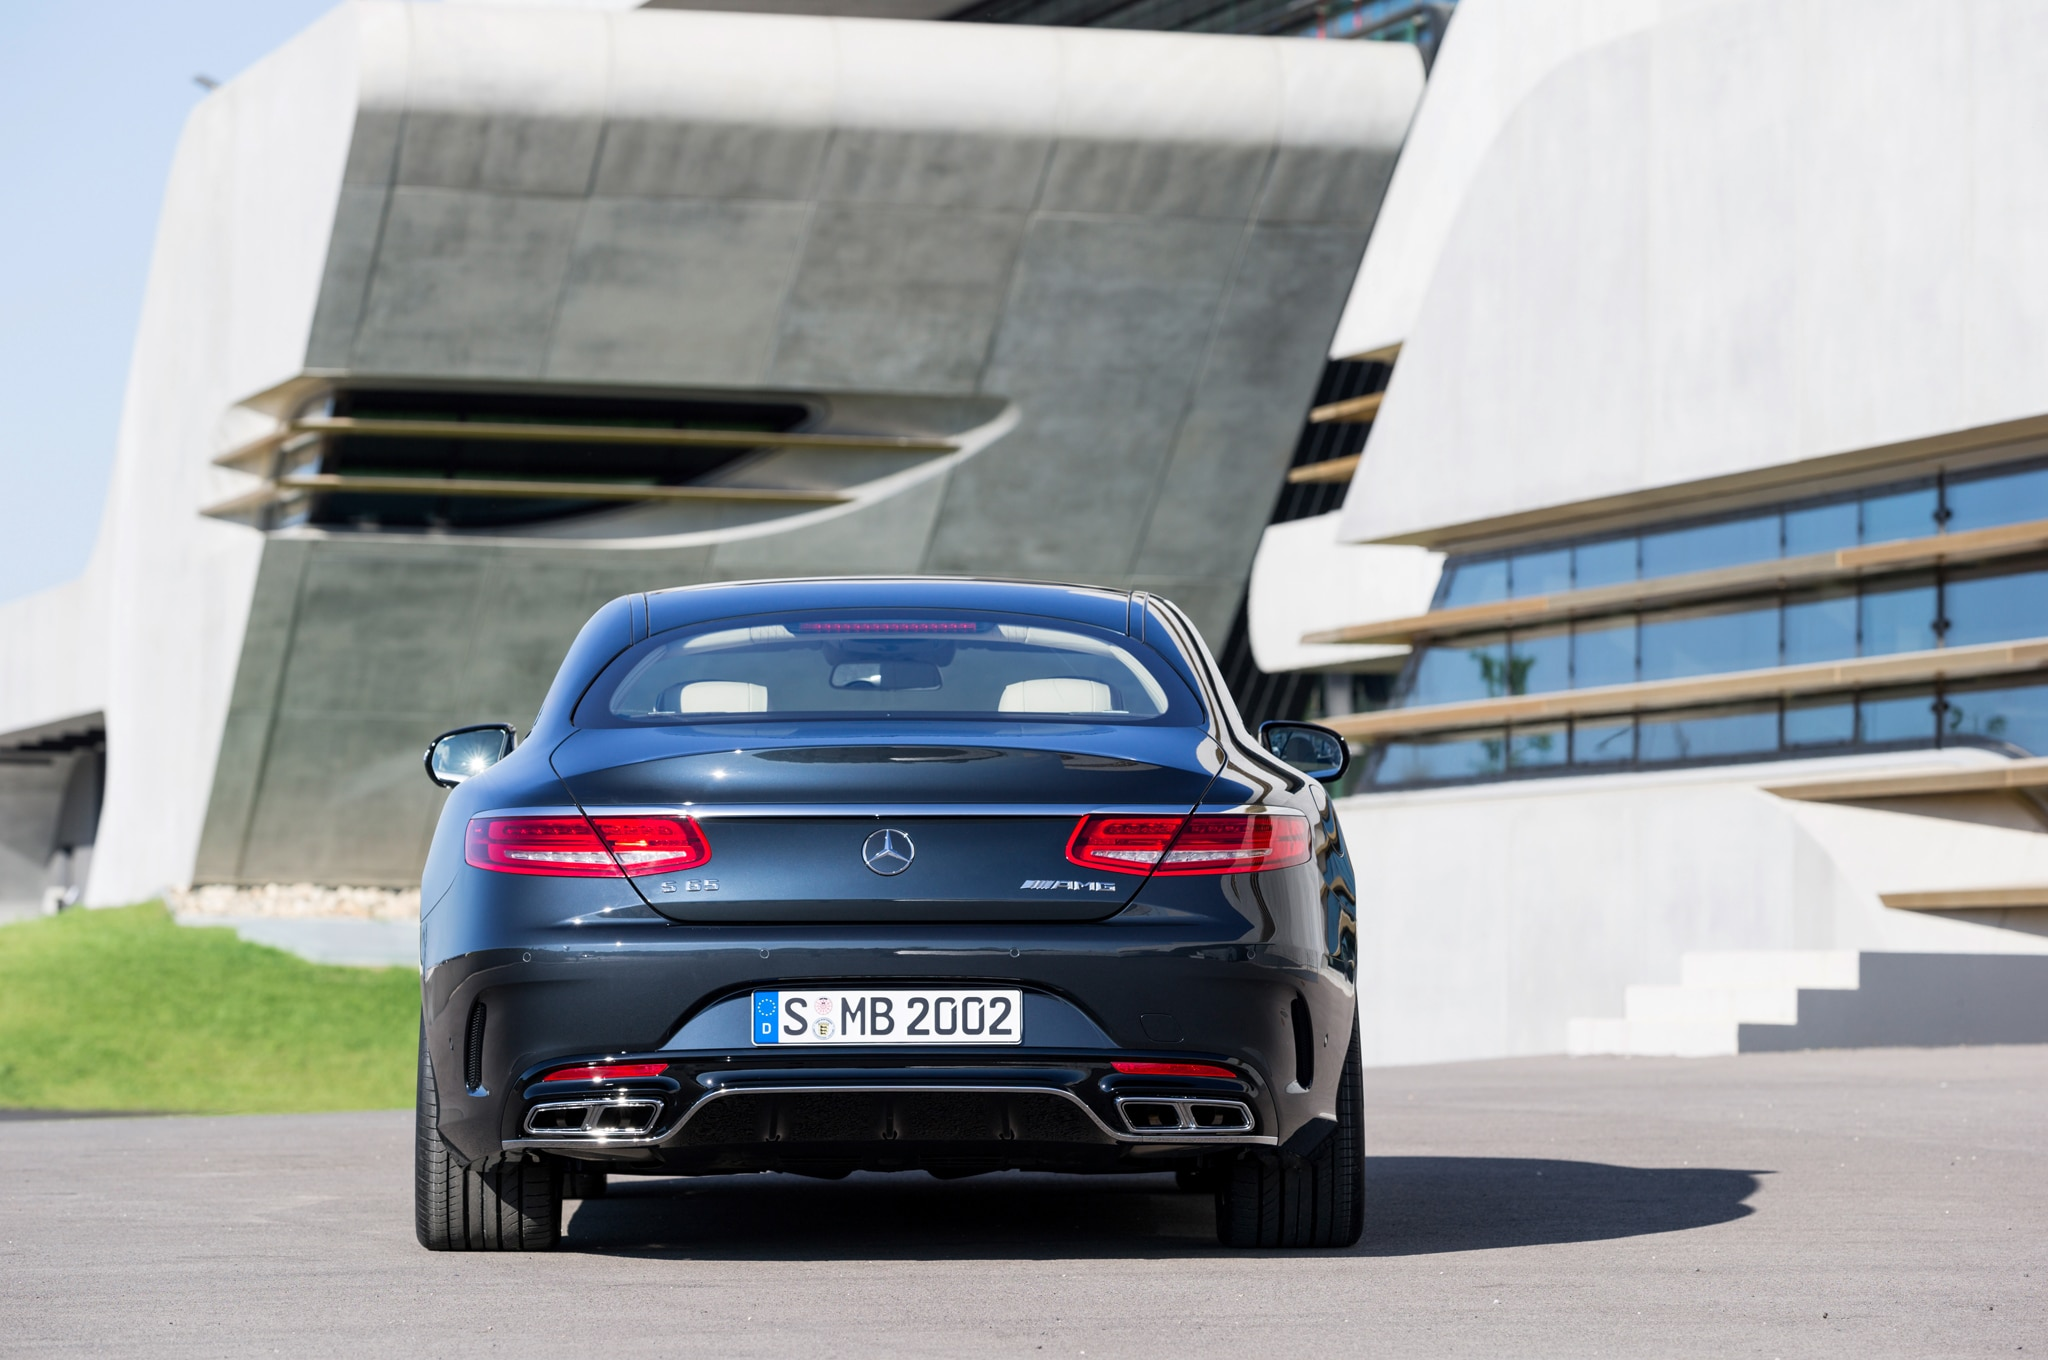 https://st.automobilemag.com/uploads/sites/11/2014/07/2015-Mercedes-Benz-S65-AMG-Coupe-rear-end-02.jpg